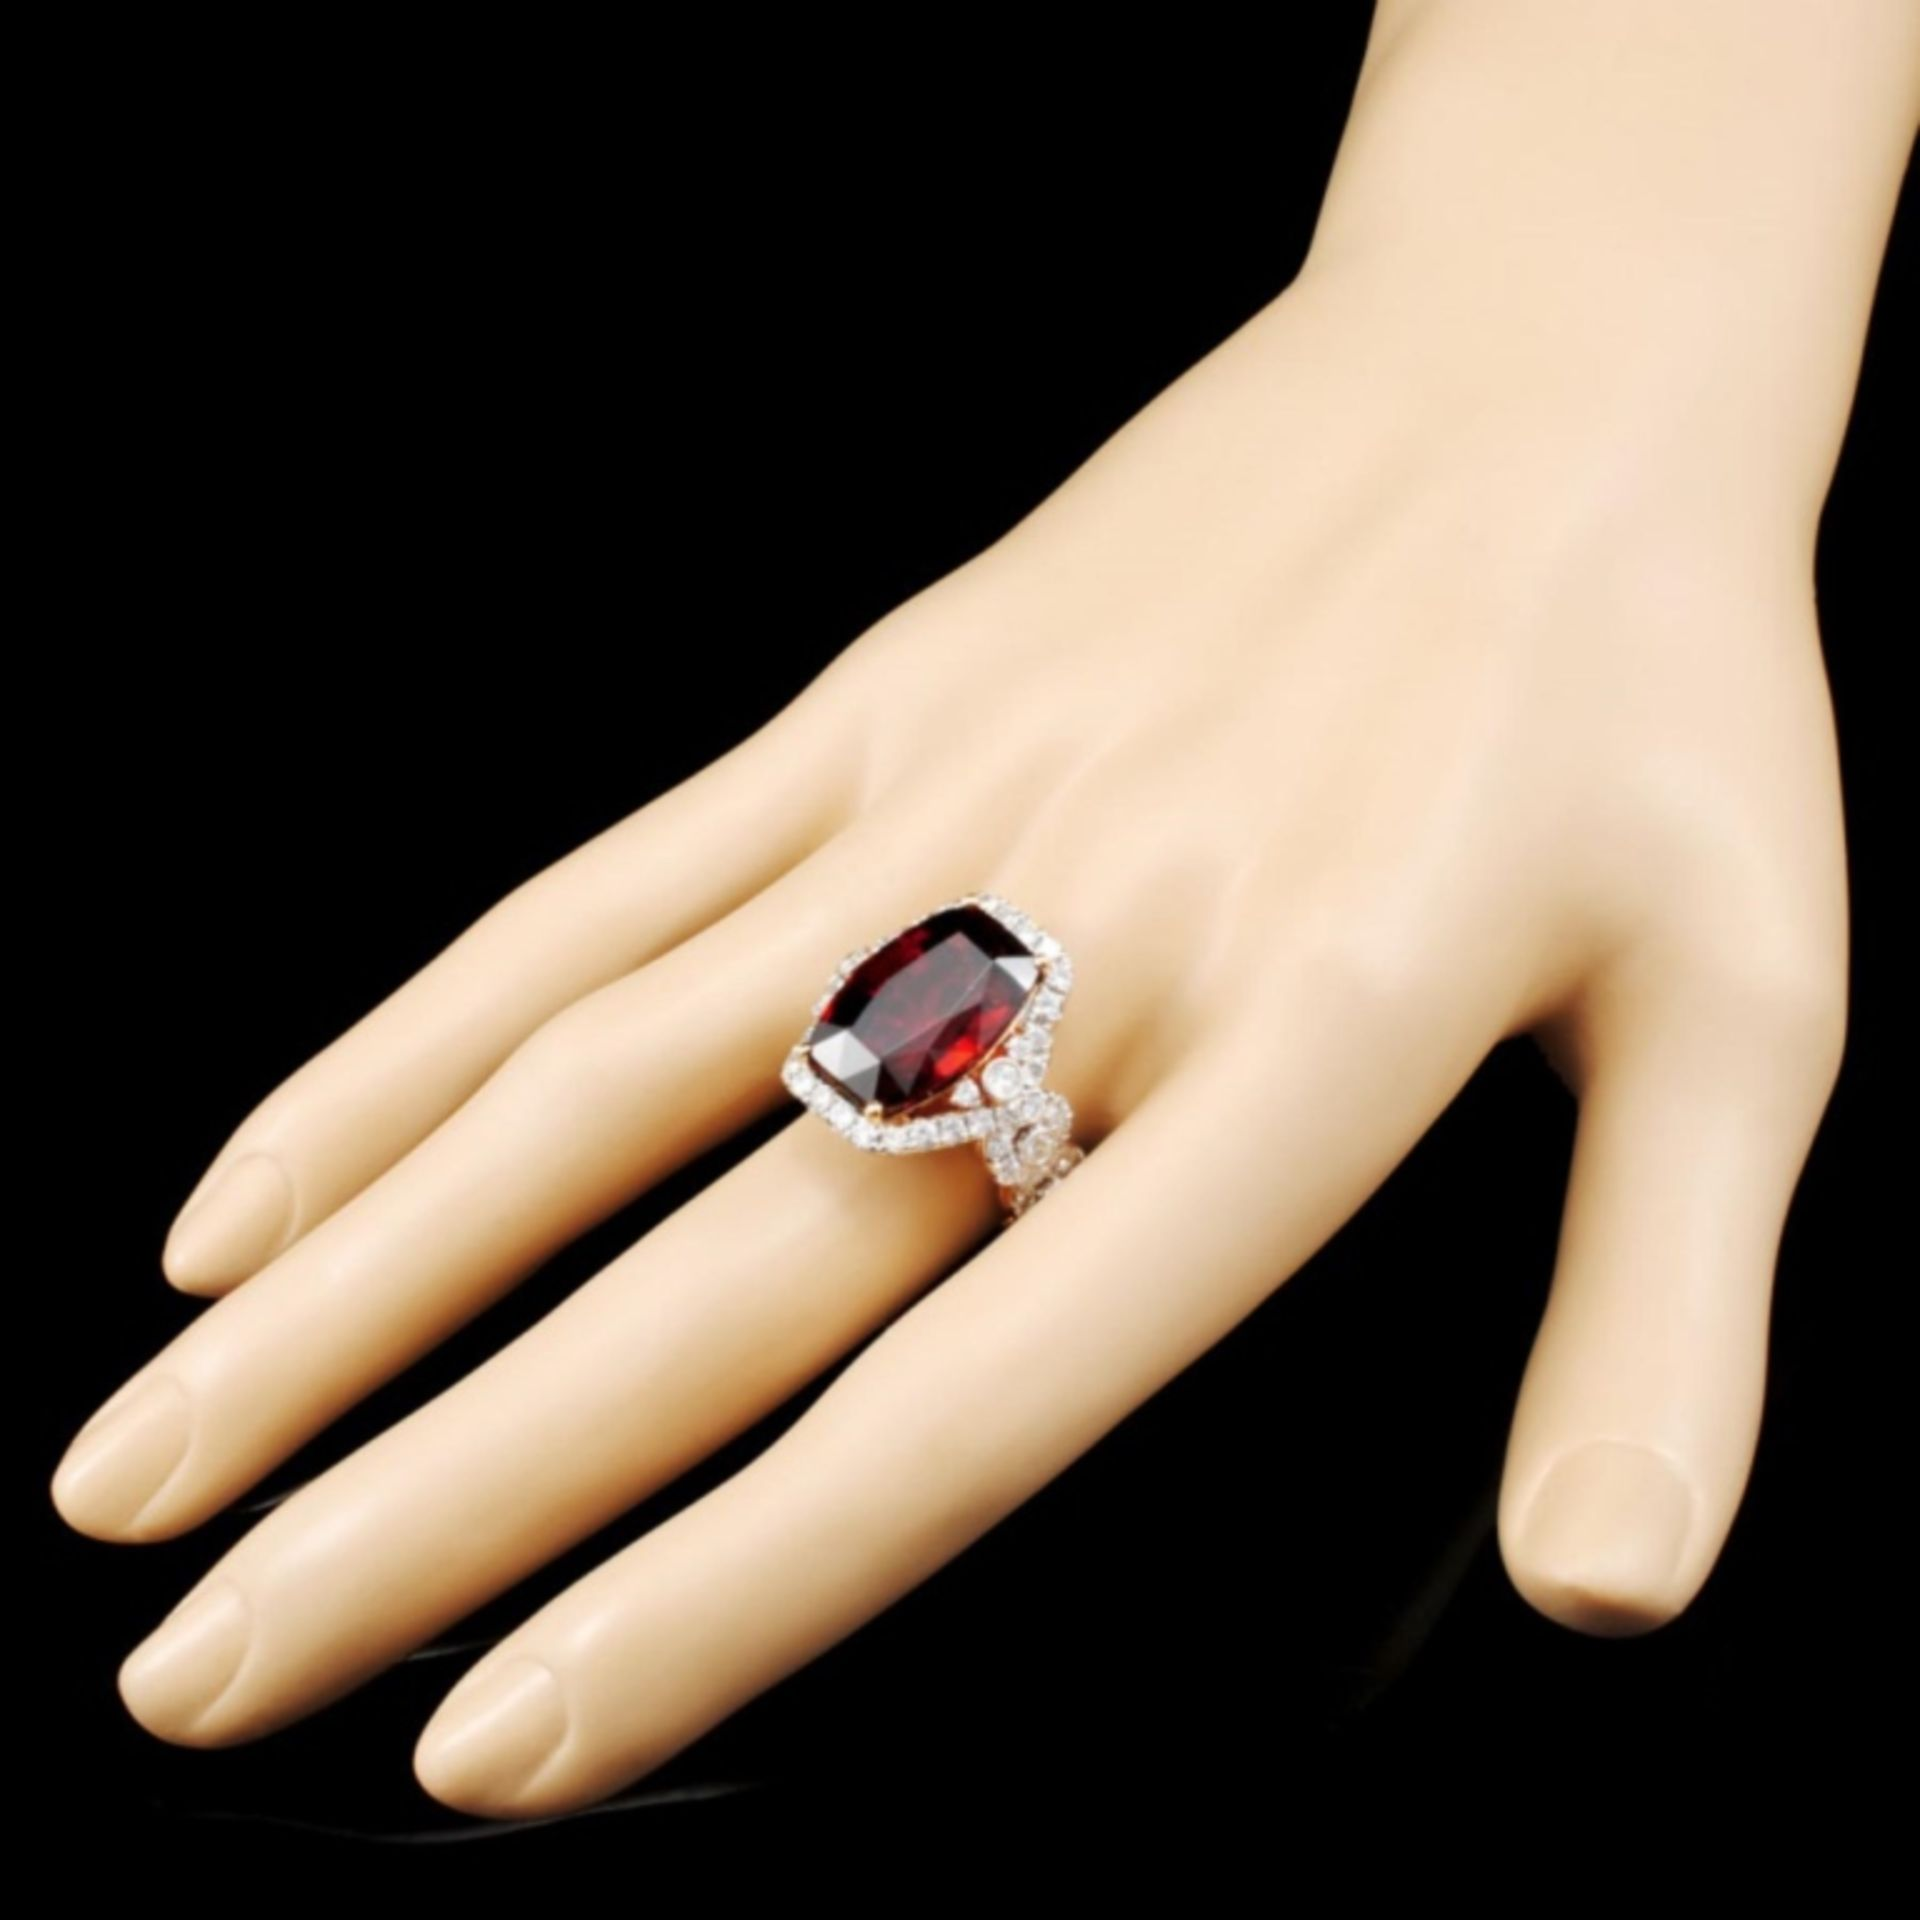 18K Gold 16.46ct Garnet & 1.81ctw Diamond Ring - Image 3 of 5